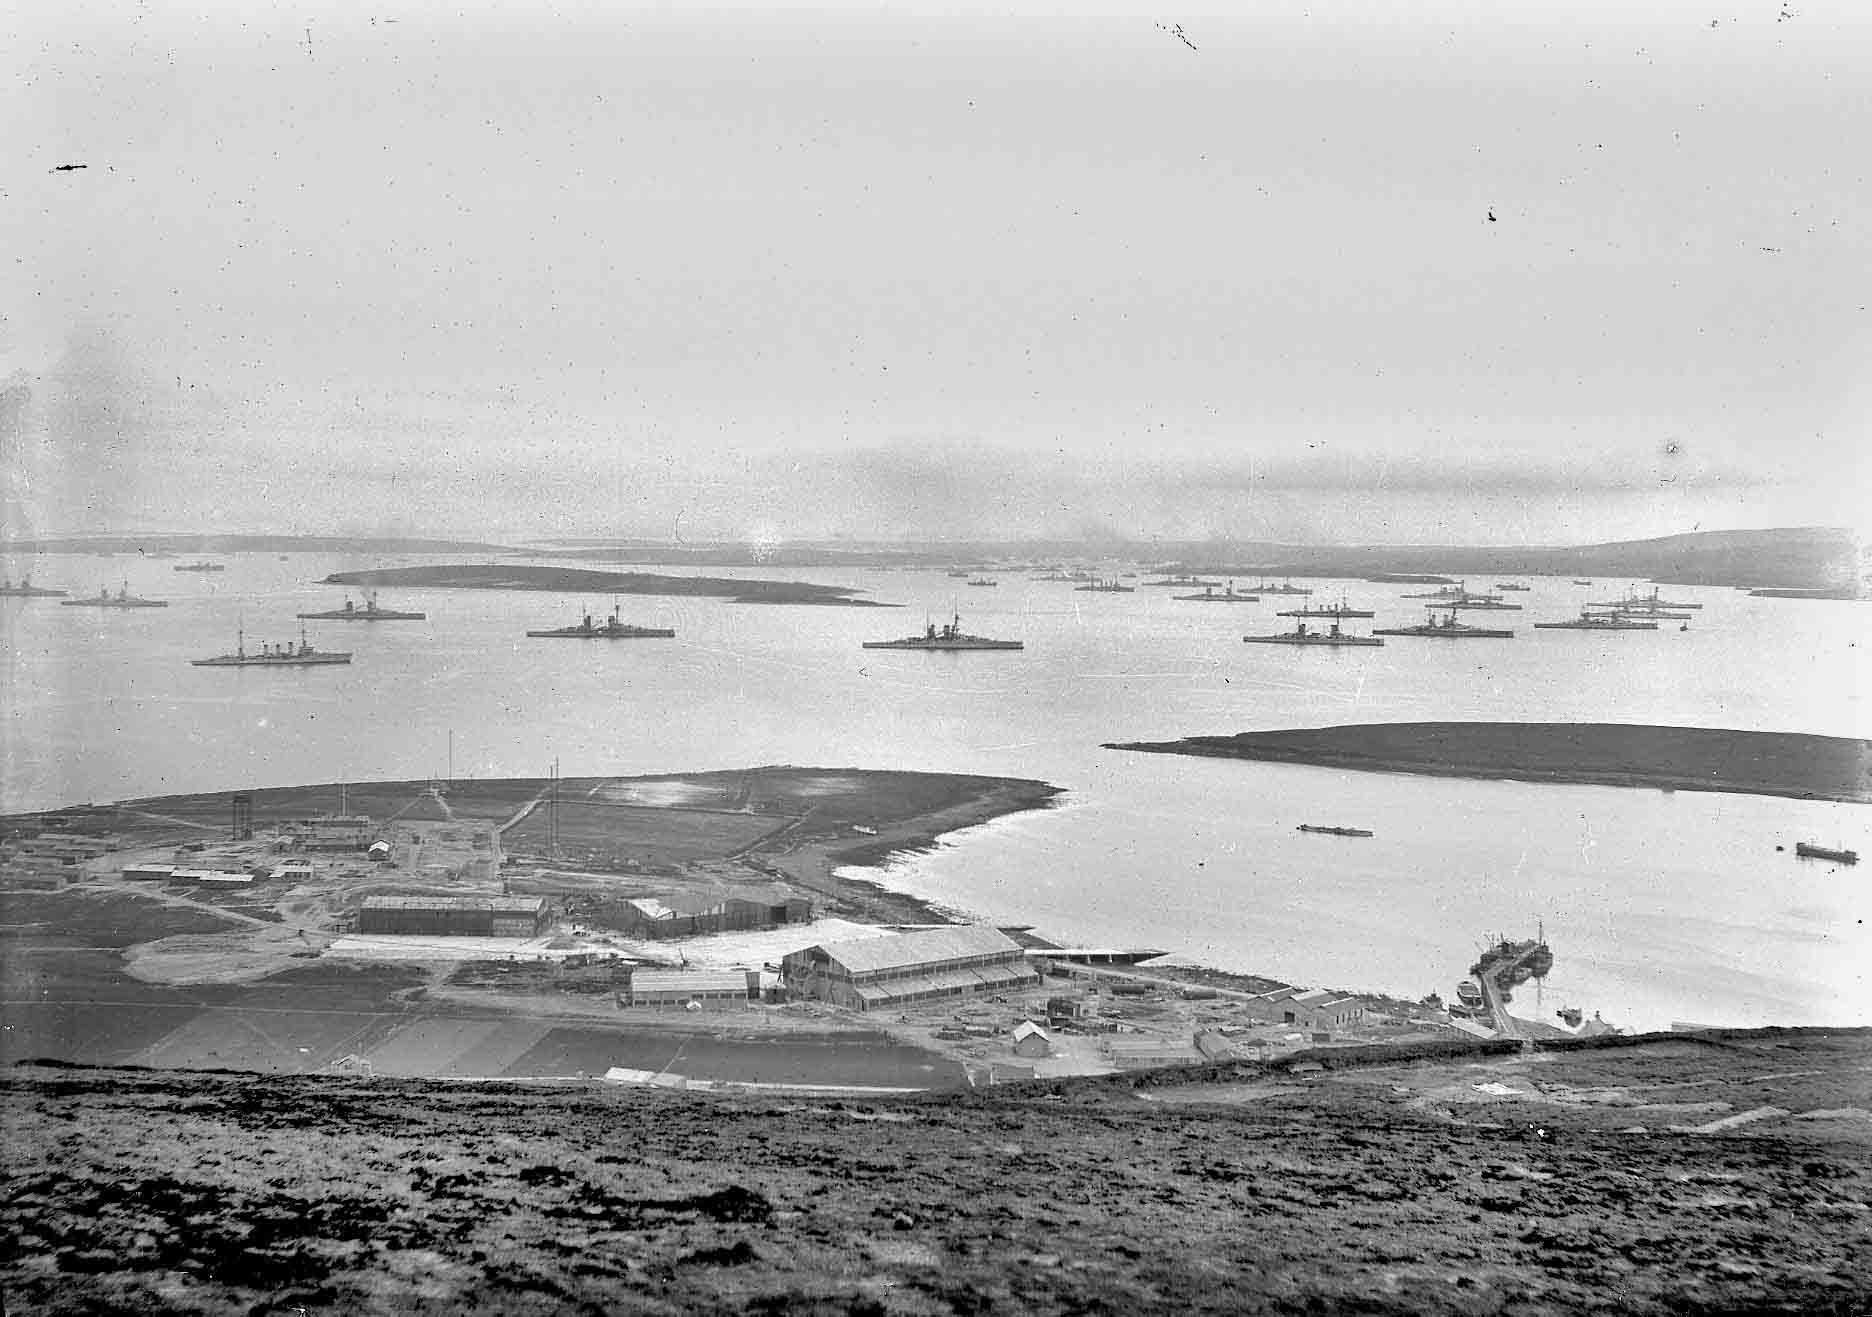 German High Seas Fleet in Orkney's Scapa Flow, WWI - photo by Tom Kent